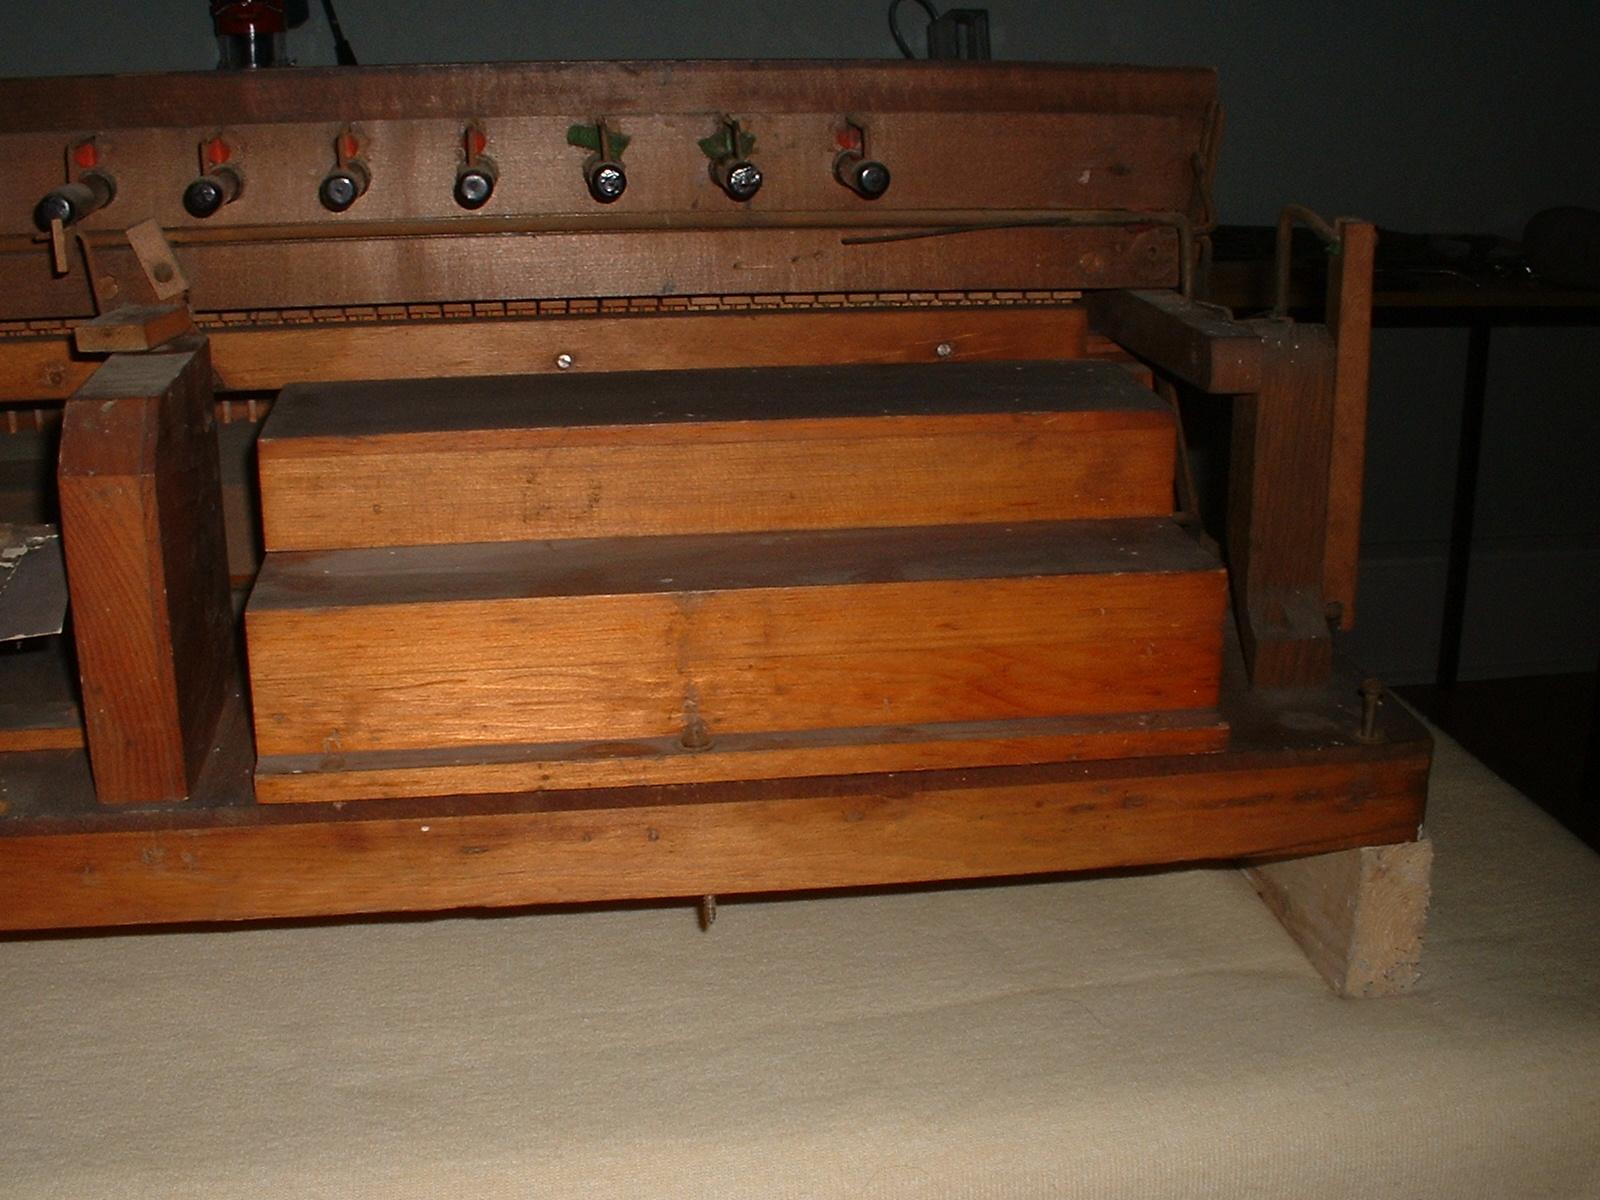 The sub-bass box